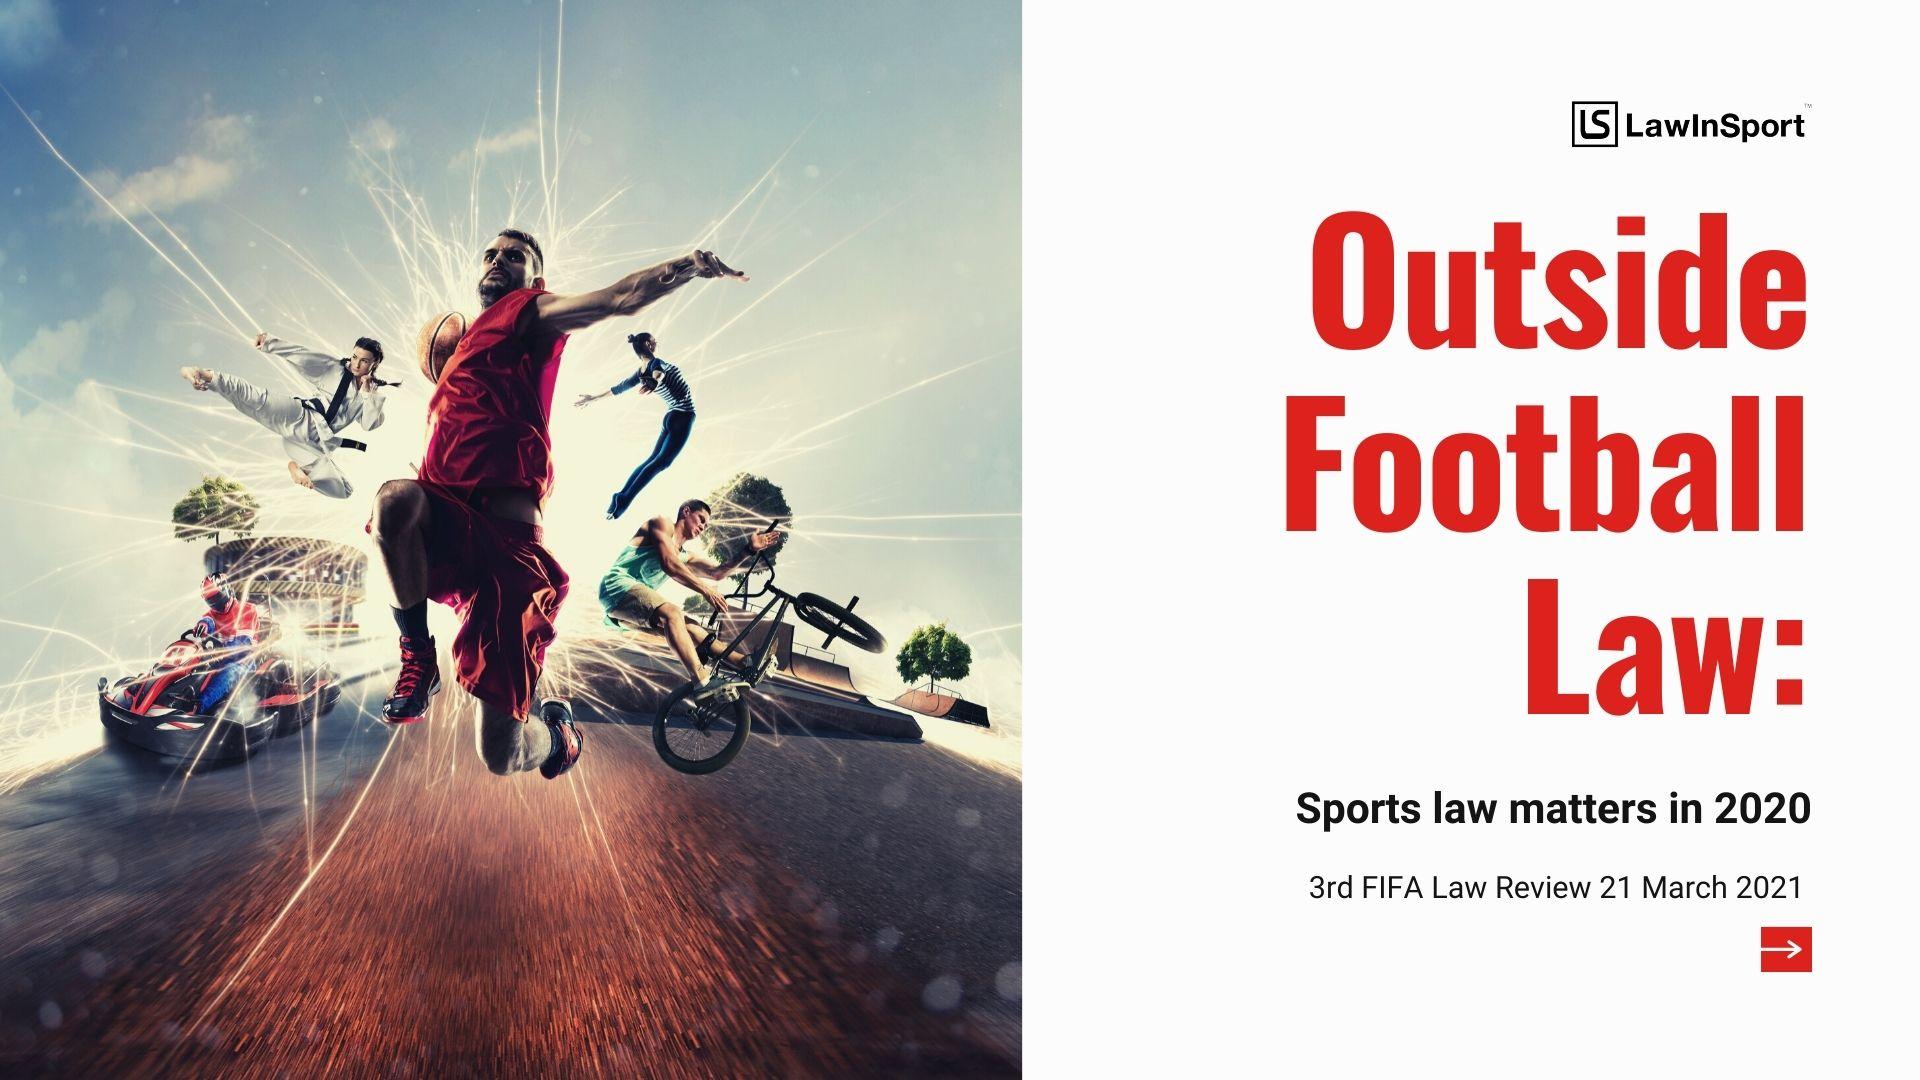 Title image: Outside Football Law